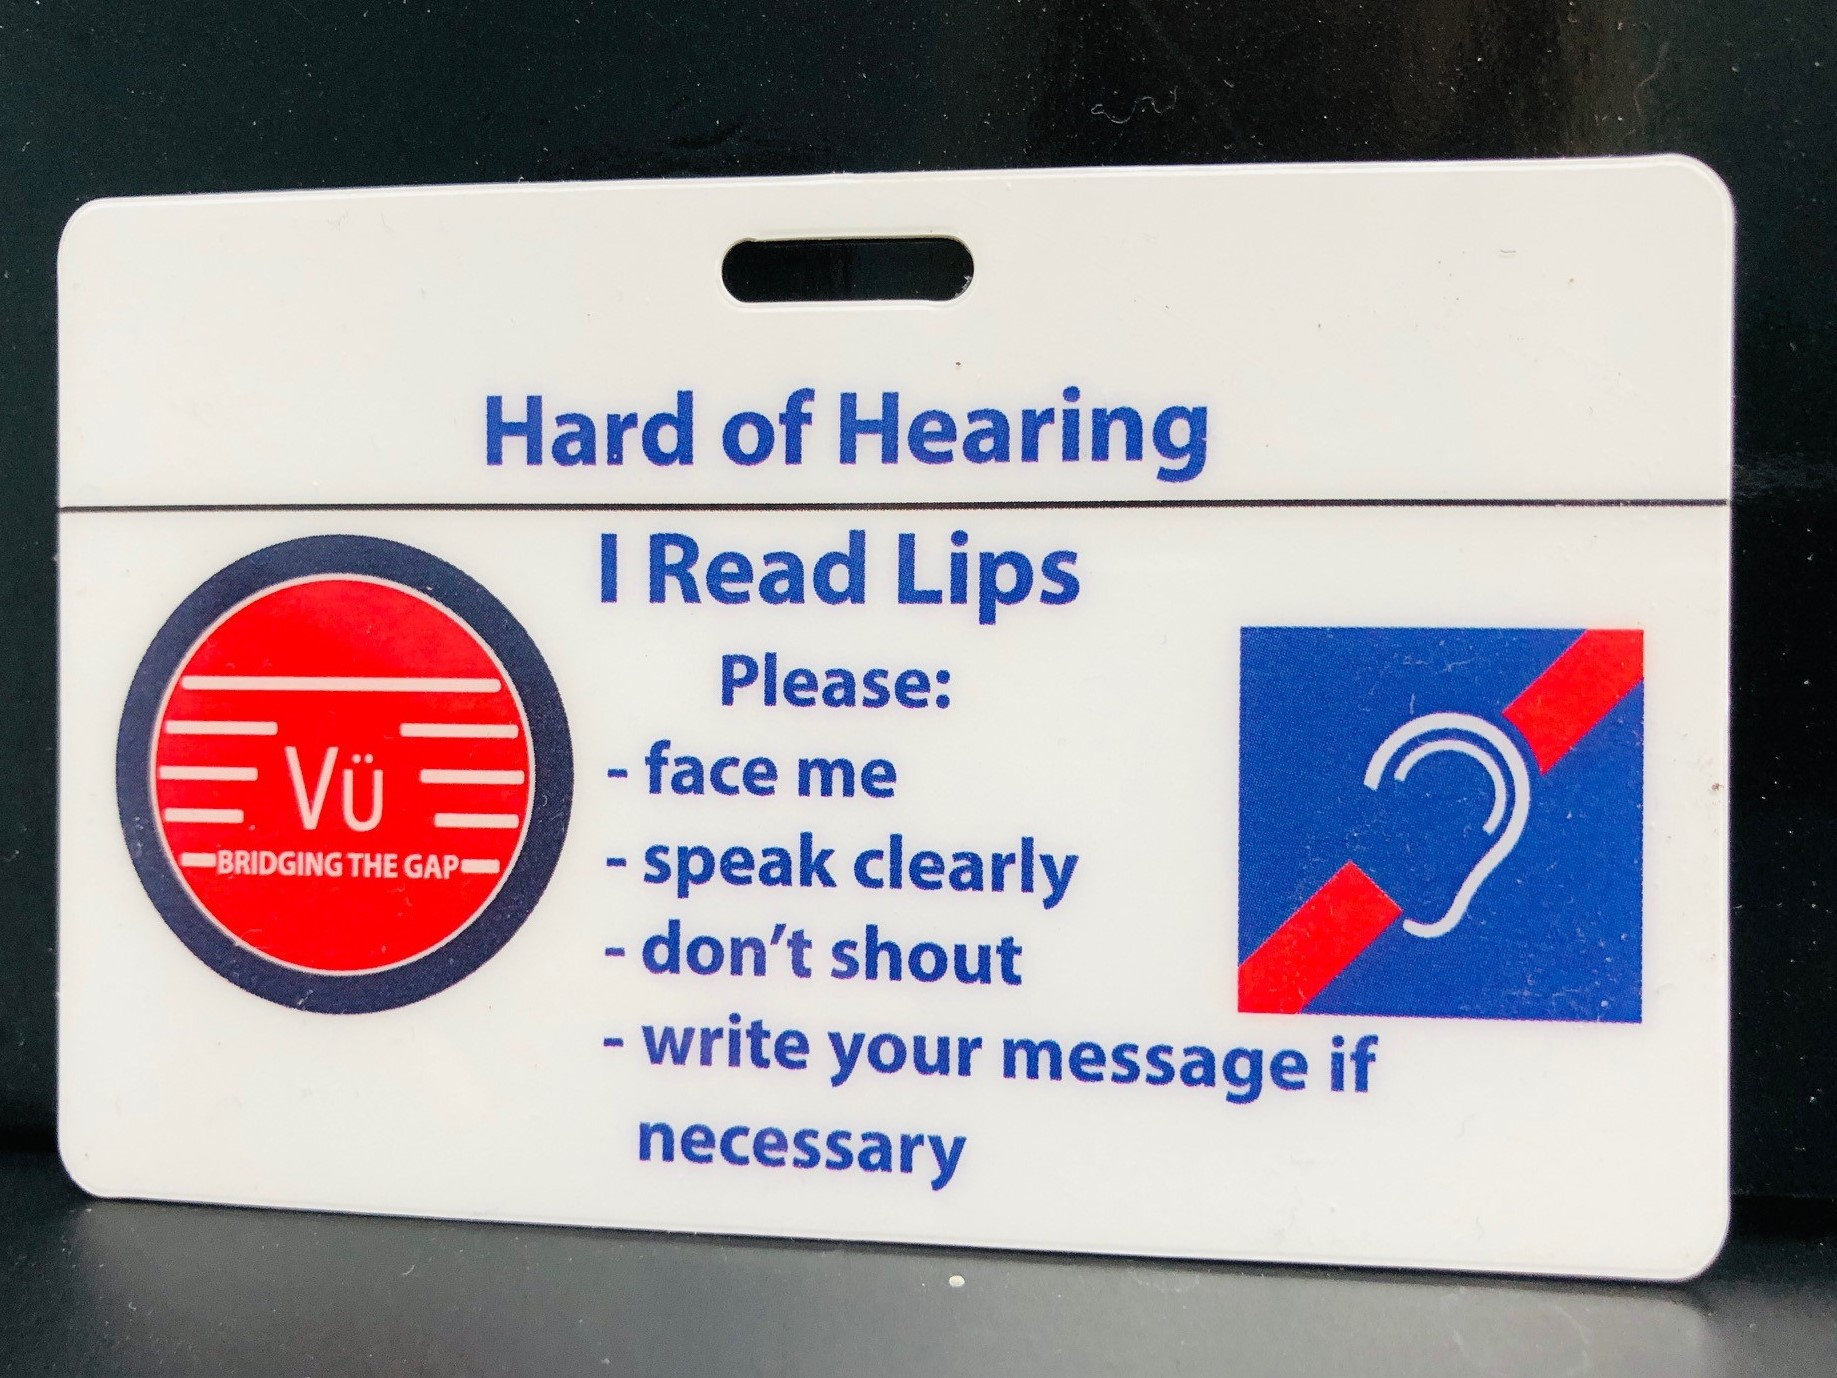 Hard of Hearing communication card